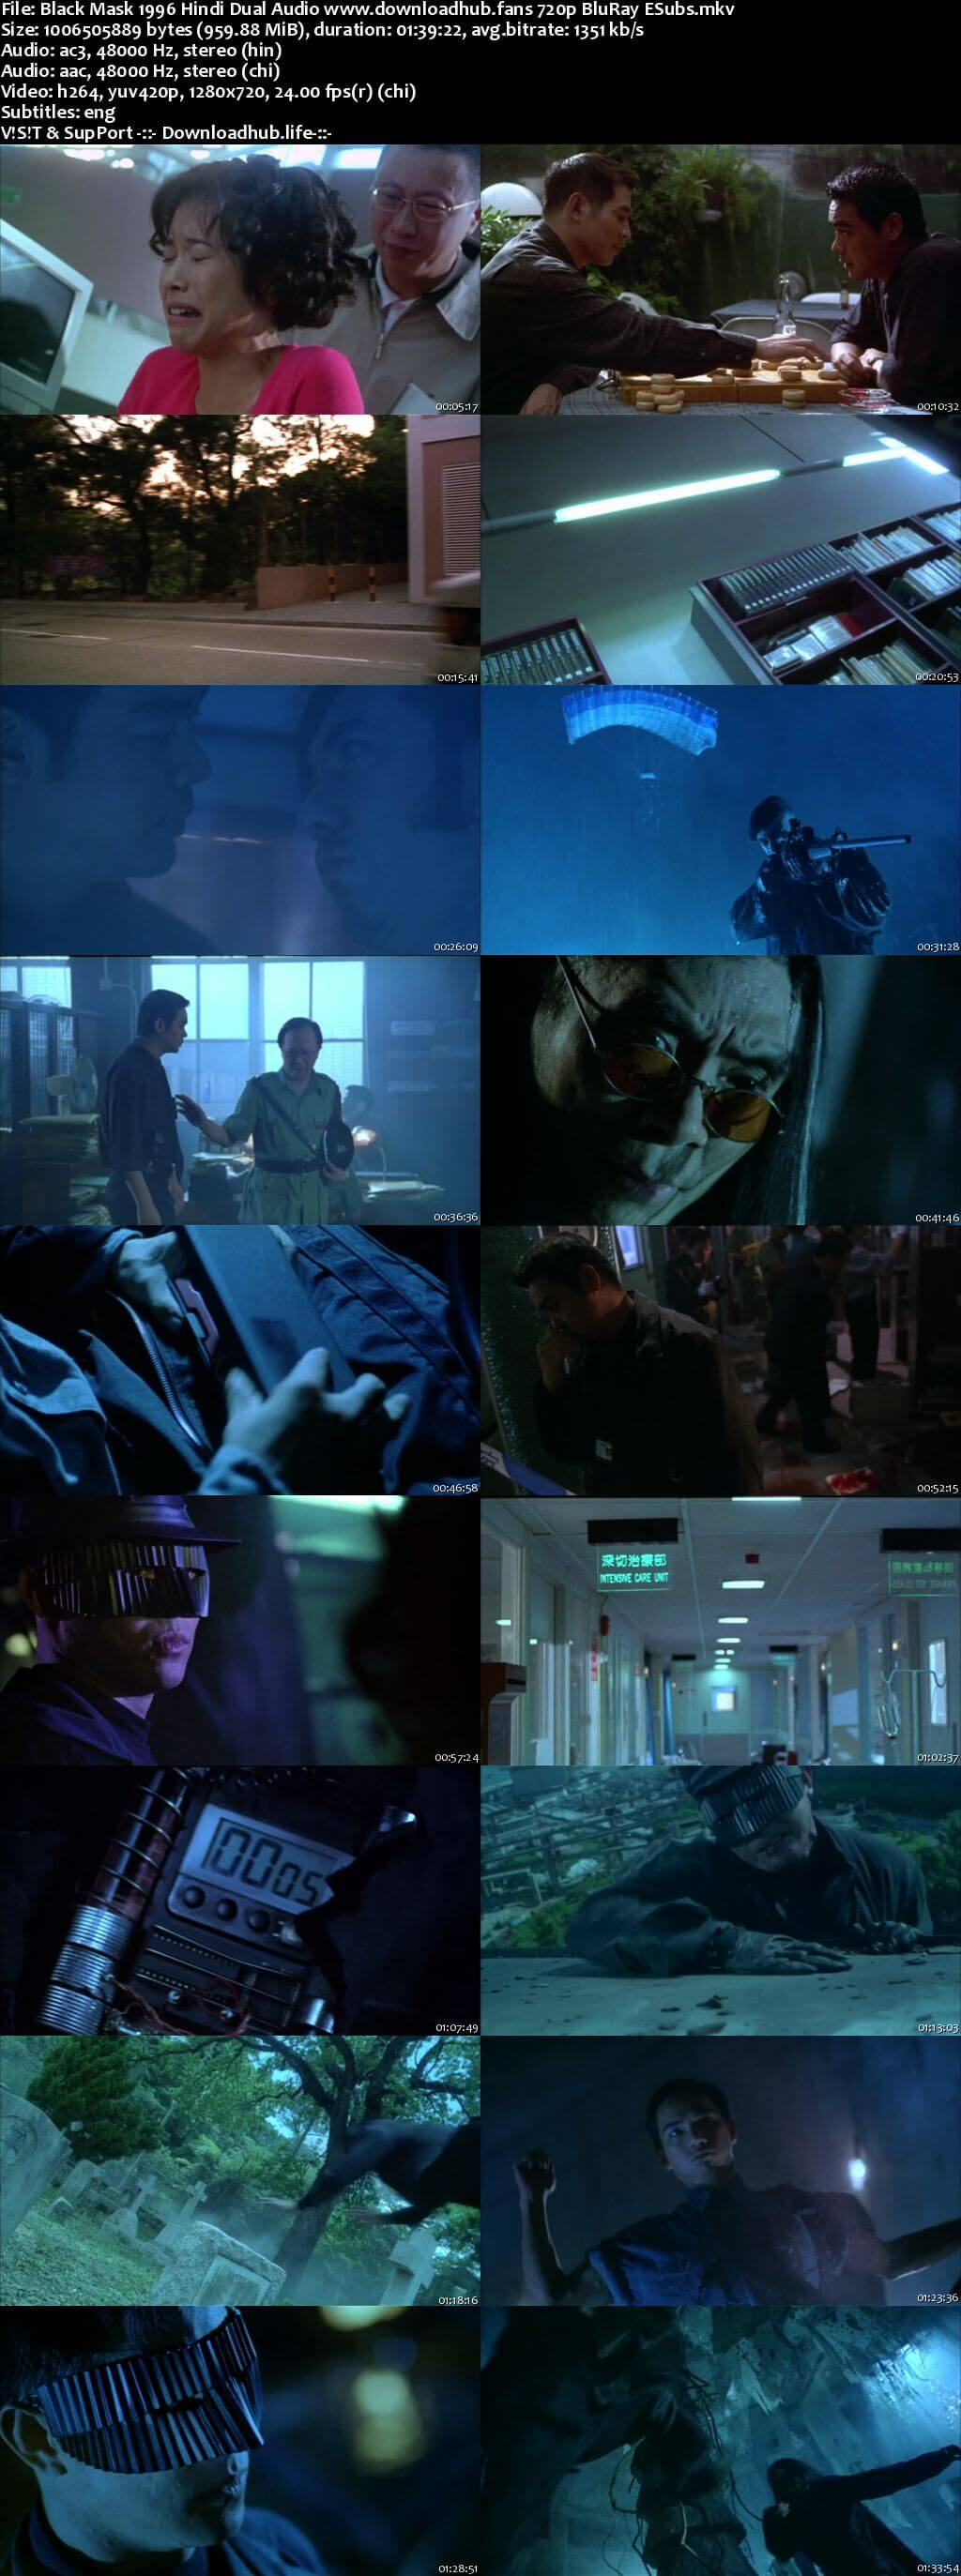 Black Mask 1996 Hindi Dual Audio 720p BluRay ESubs